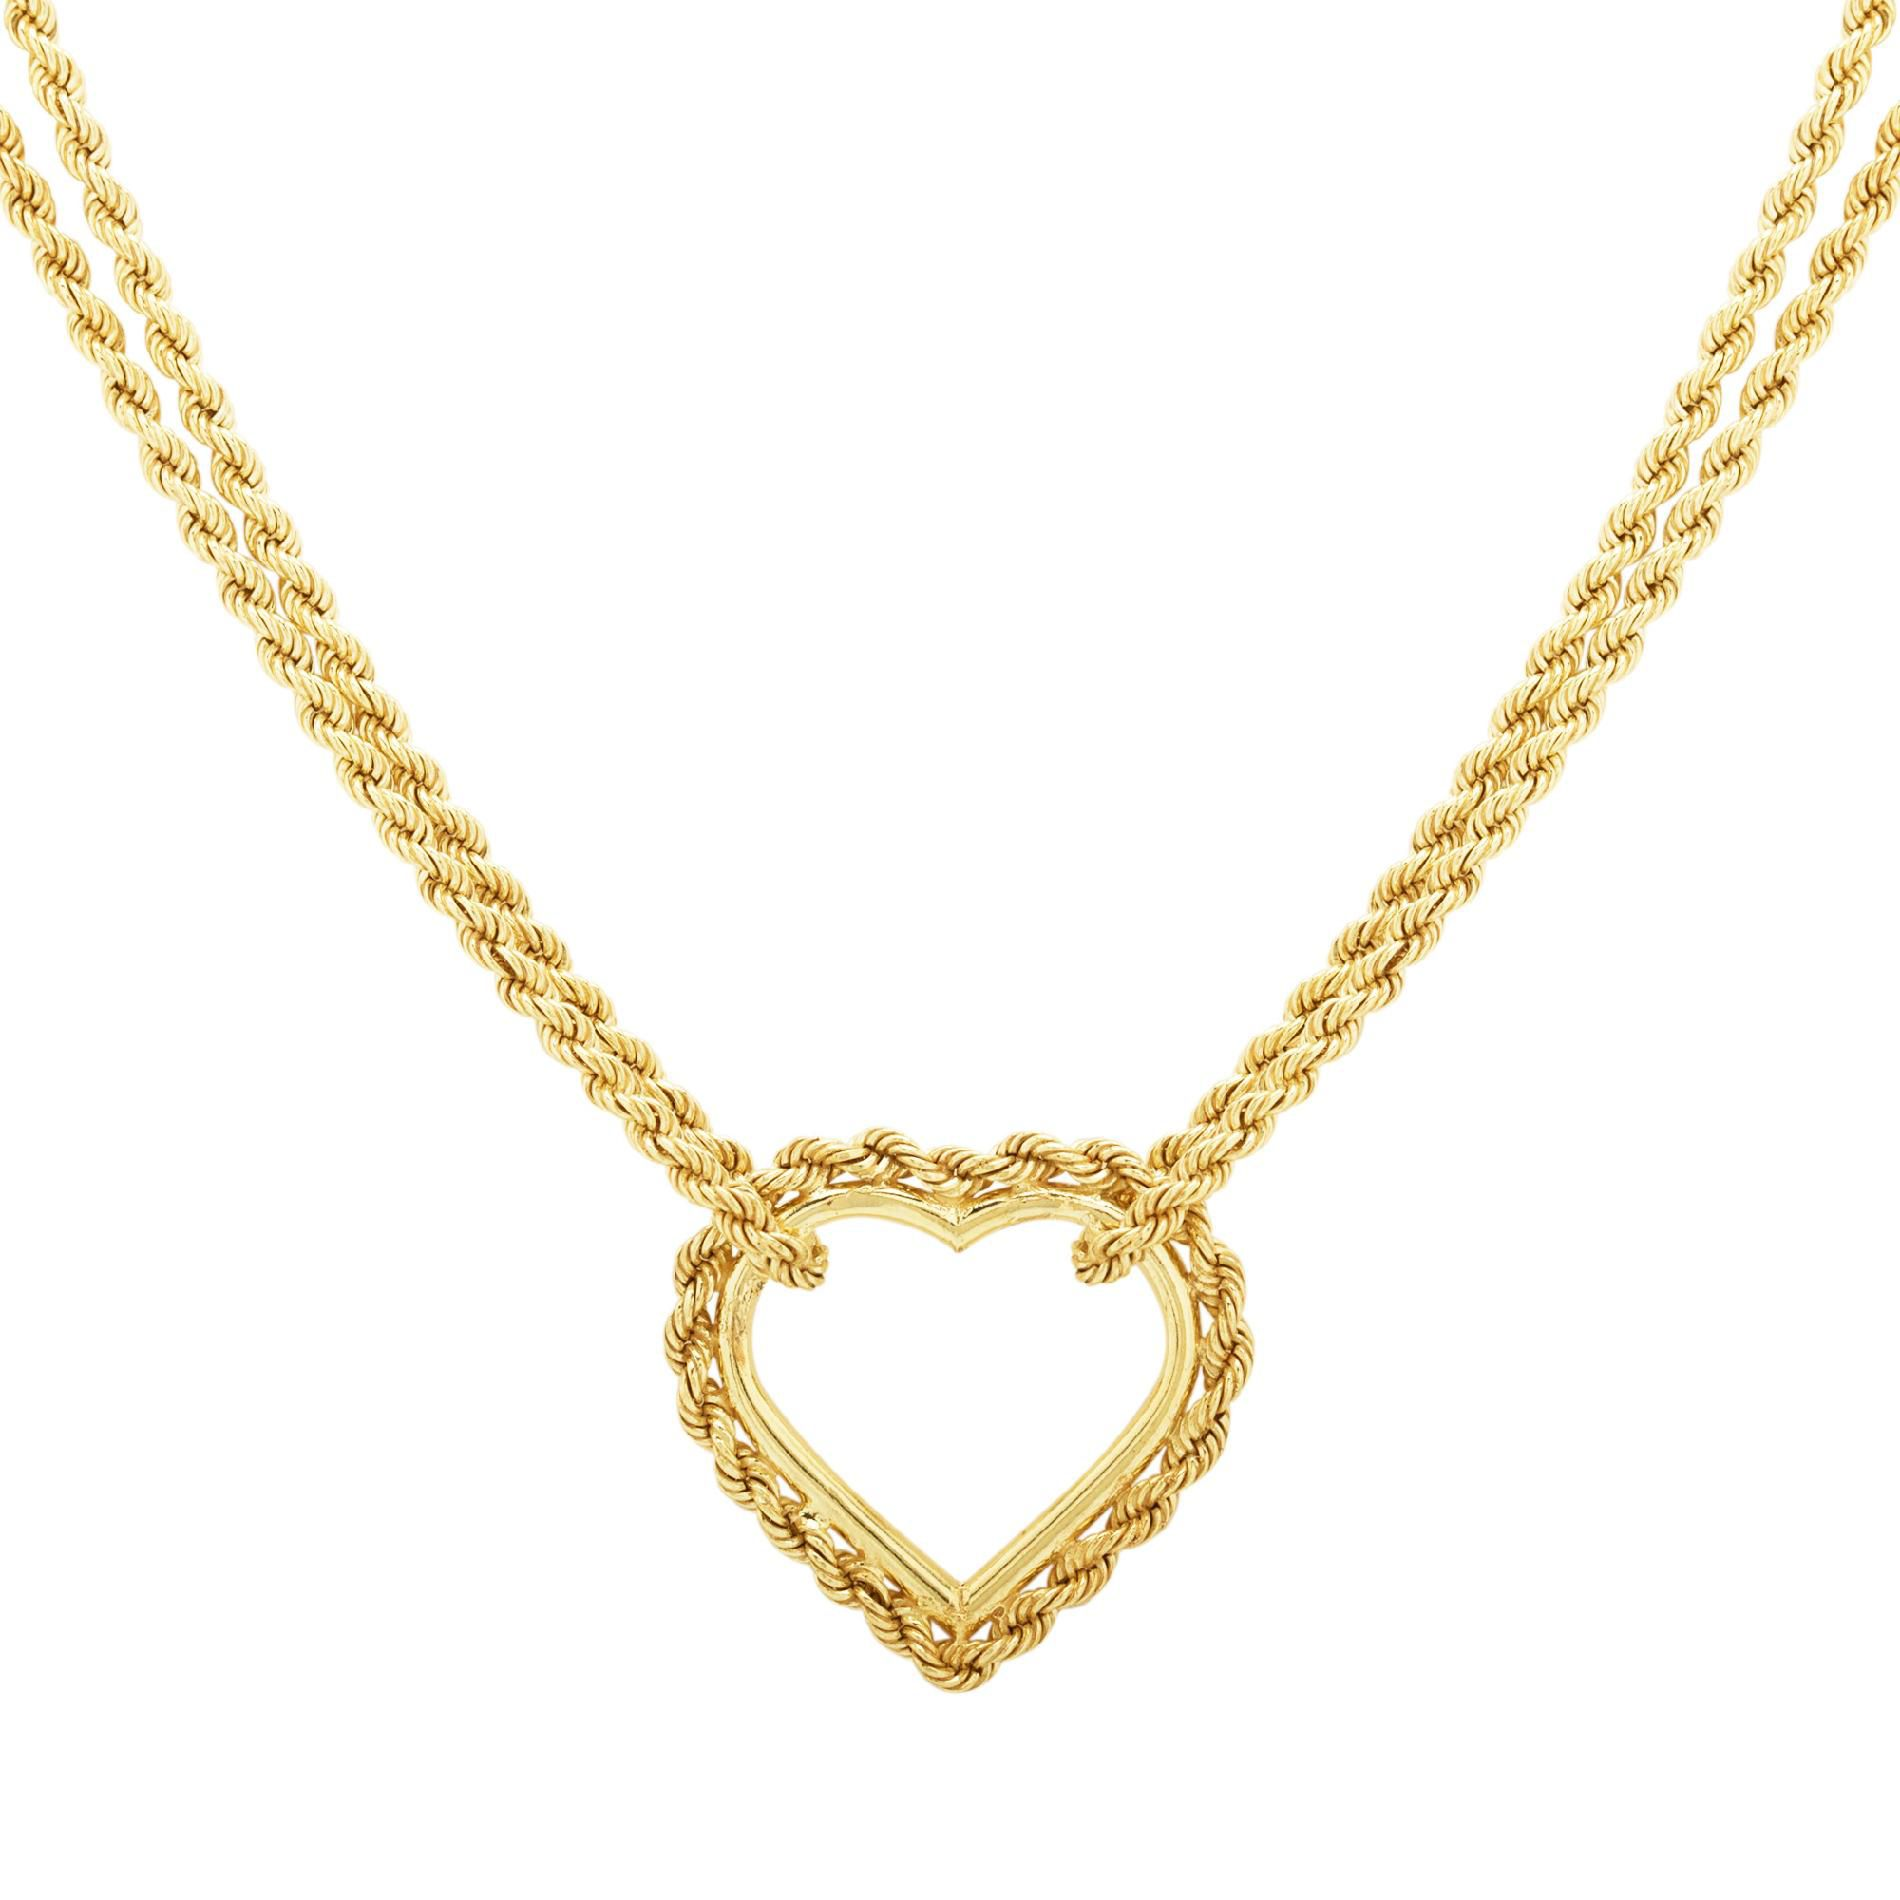 10K&SS Open Heart Necklace